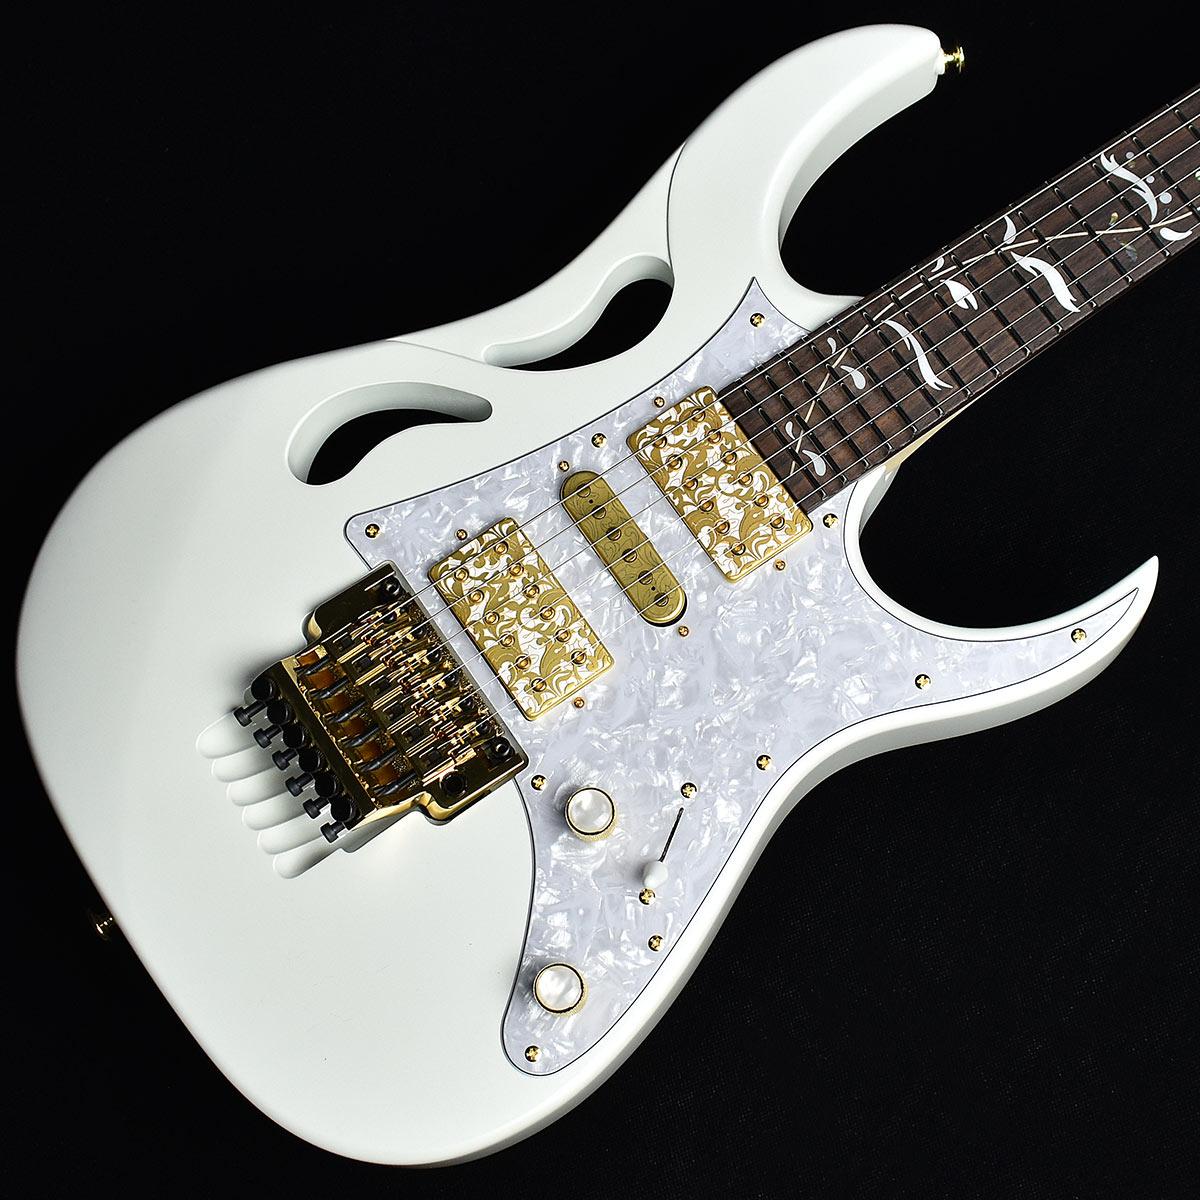 Ibanez PIA3761 Stallion White S/N:F2009244 STEVE VAI Newシグネチャーモデル 【アイバニーズ】【初回生産分】【未展示品】